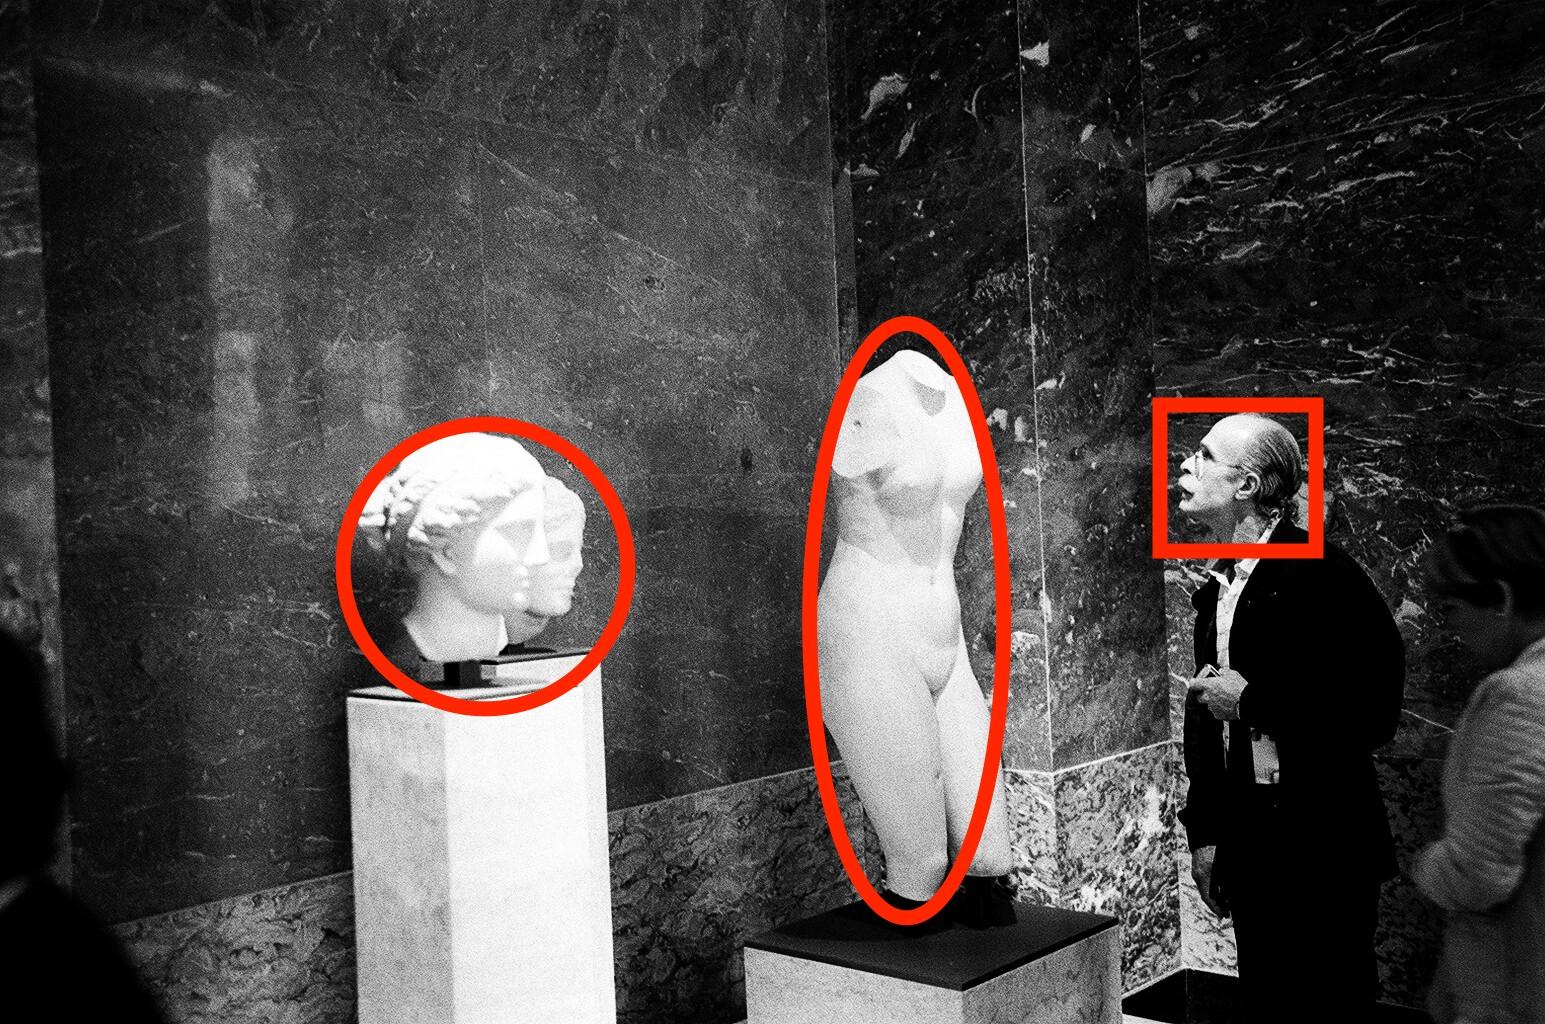 Eric kim black and white film photography Trix 1600 2015 Europe -020 copy.jpg